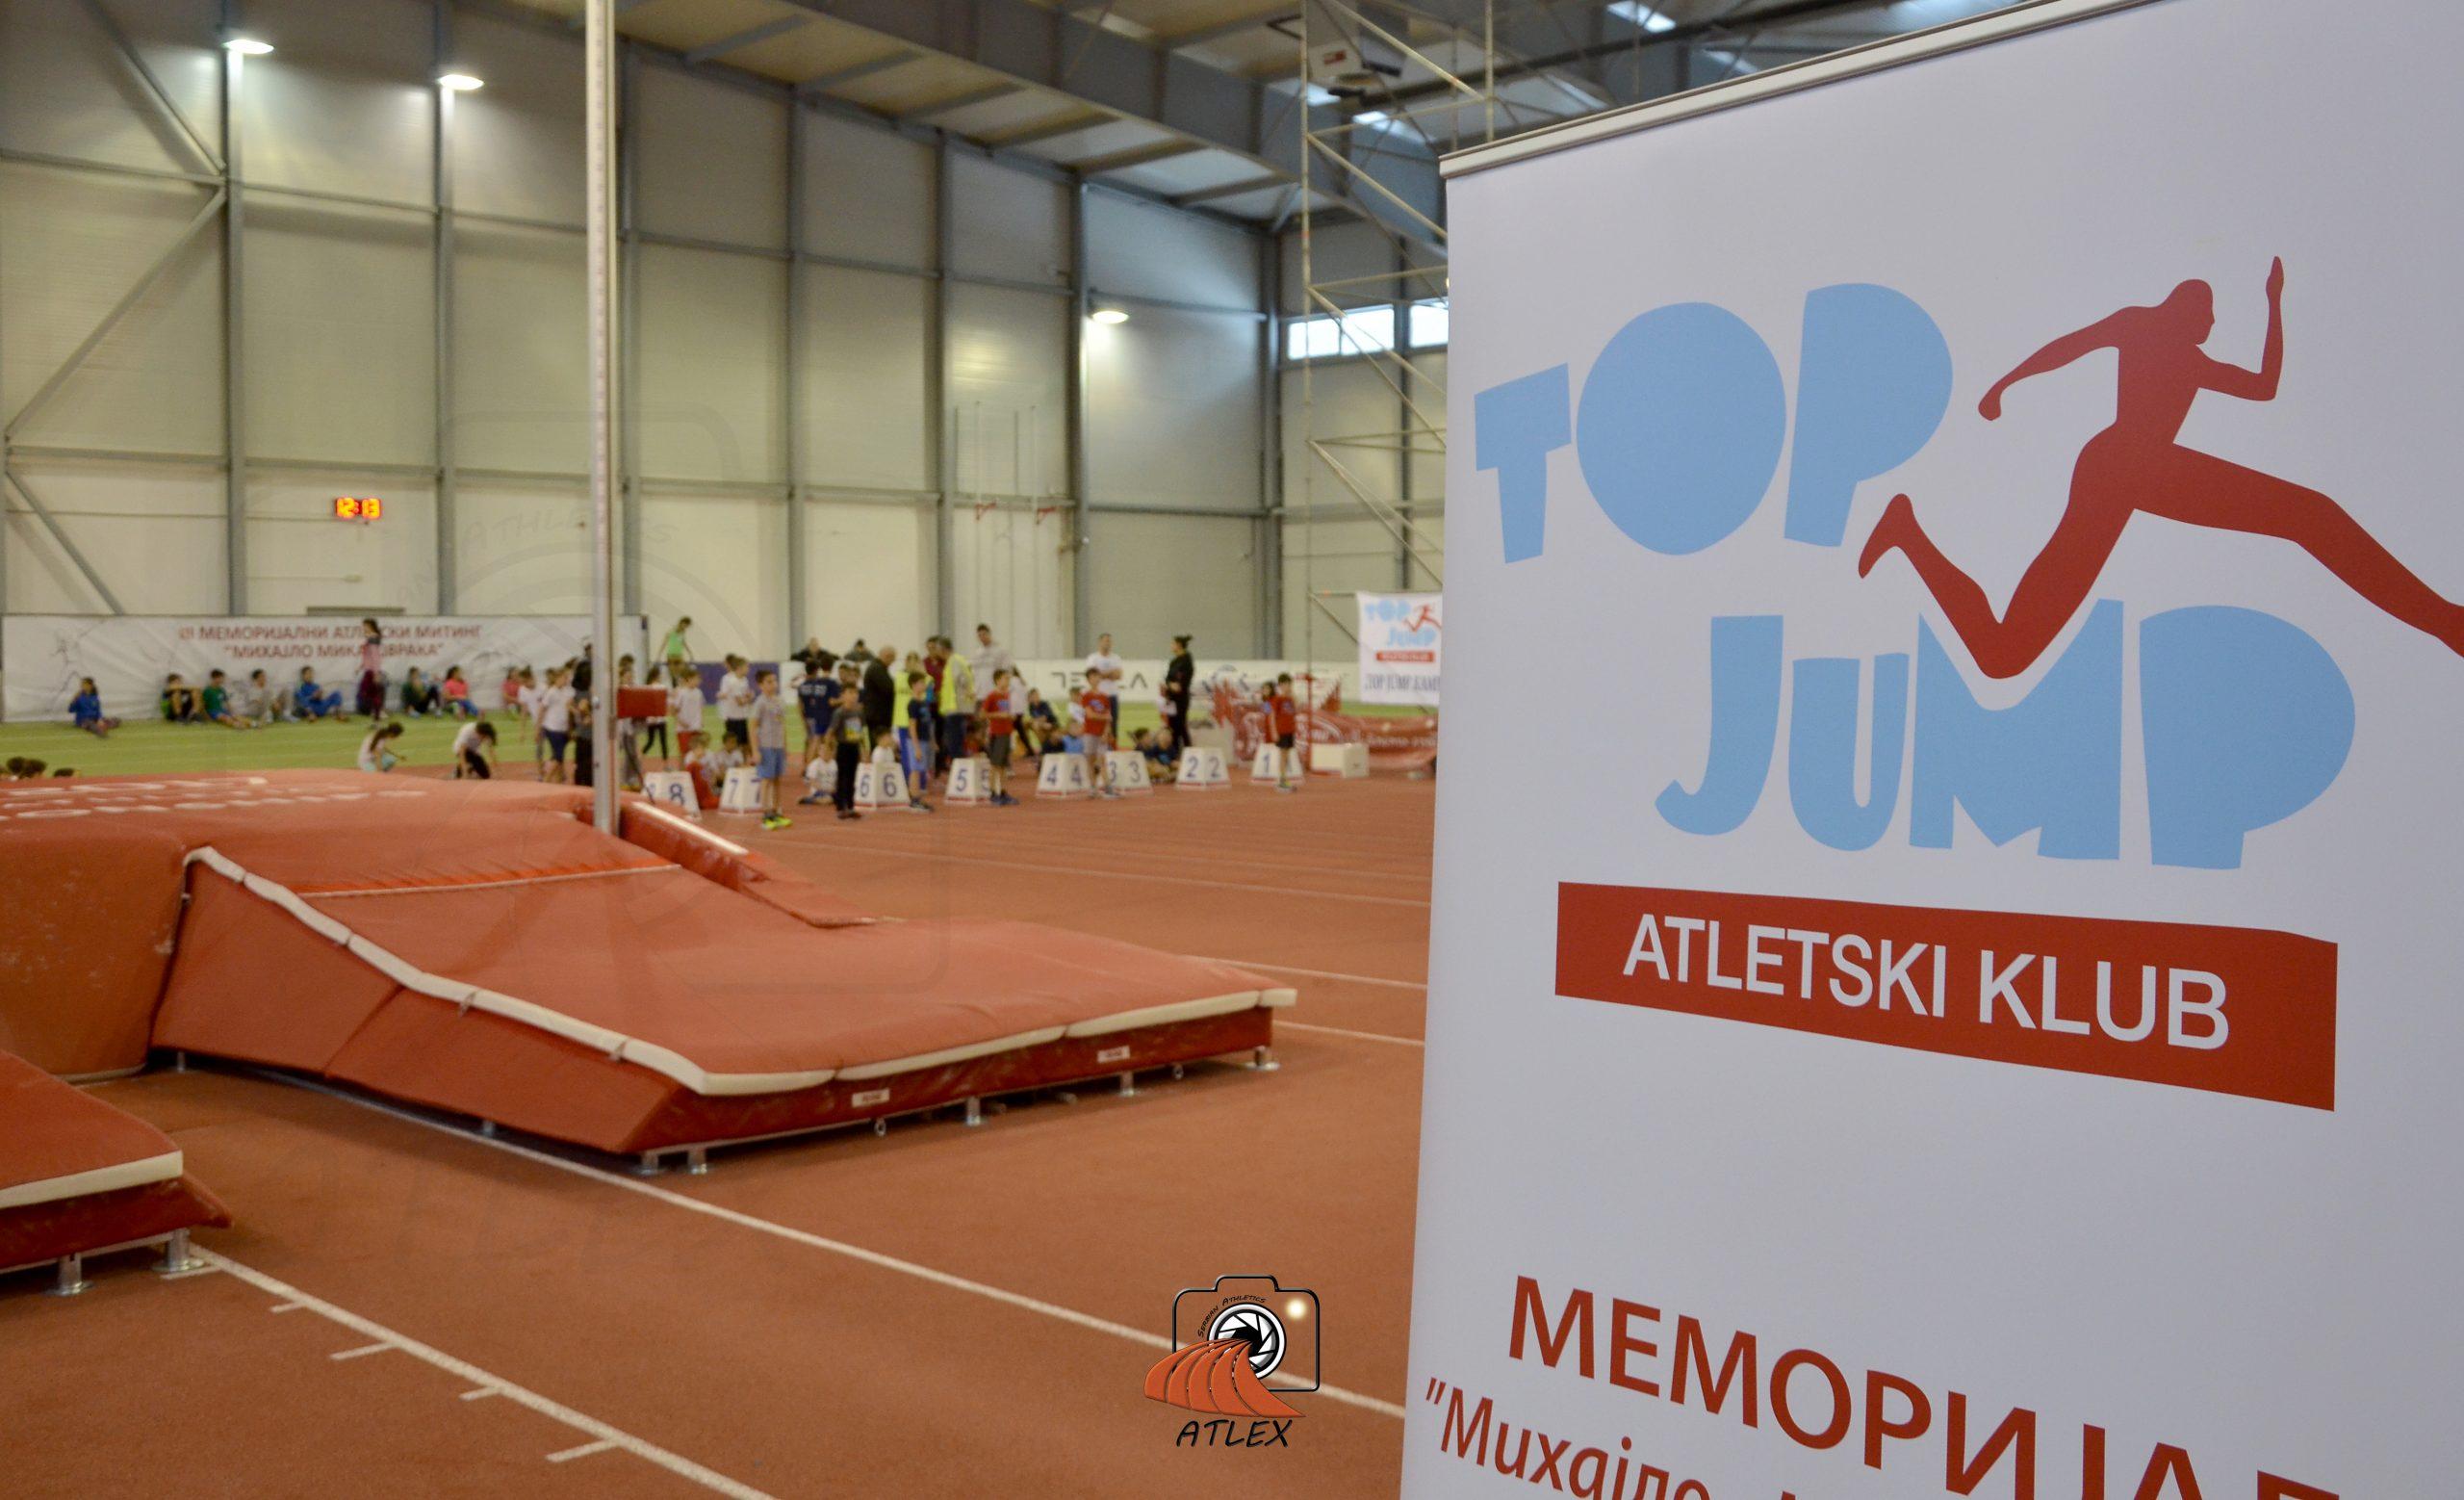 Memorijal Mihajlo Švraka 2018 - AK Top Jump